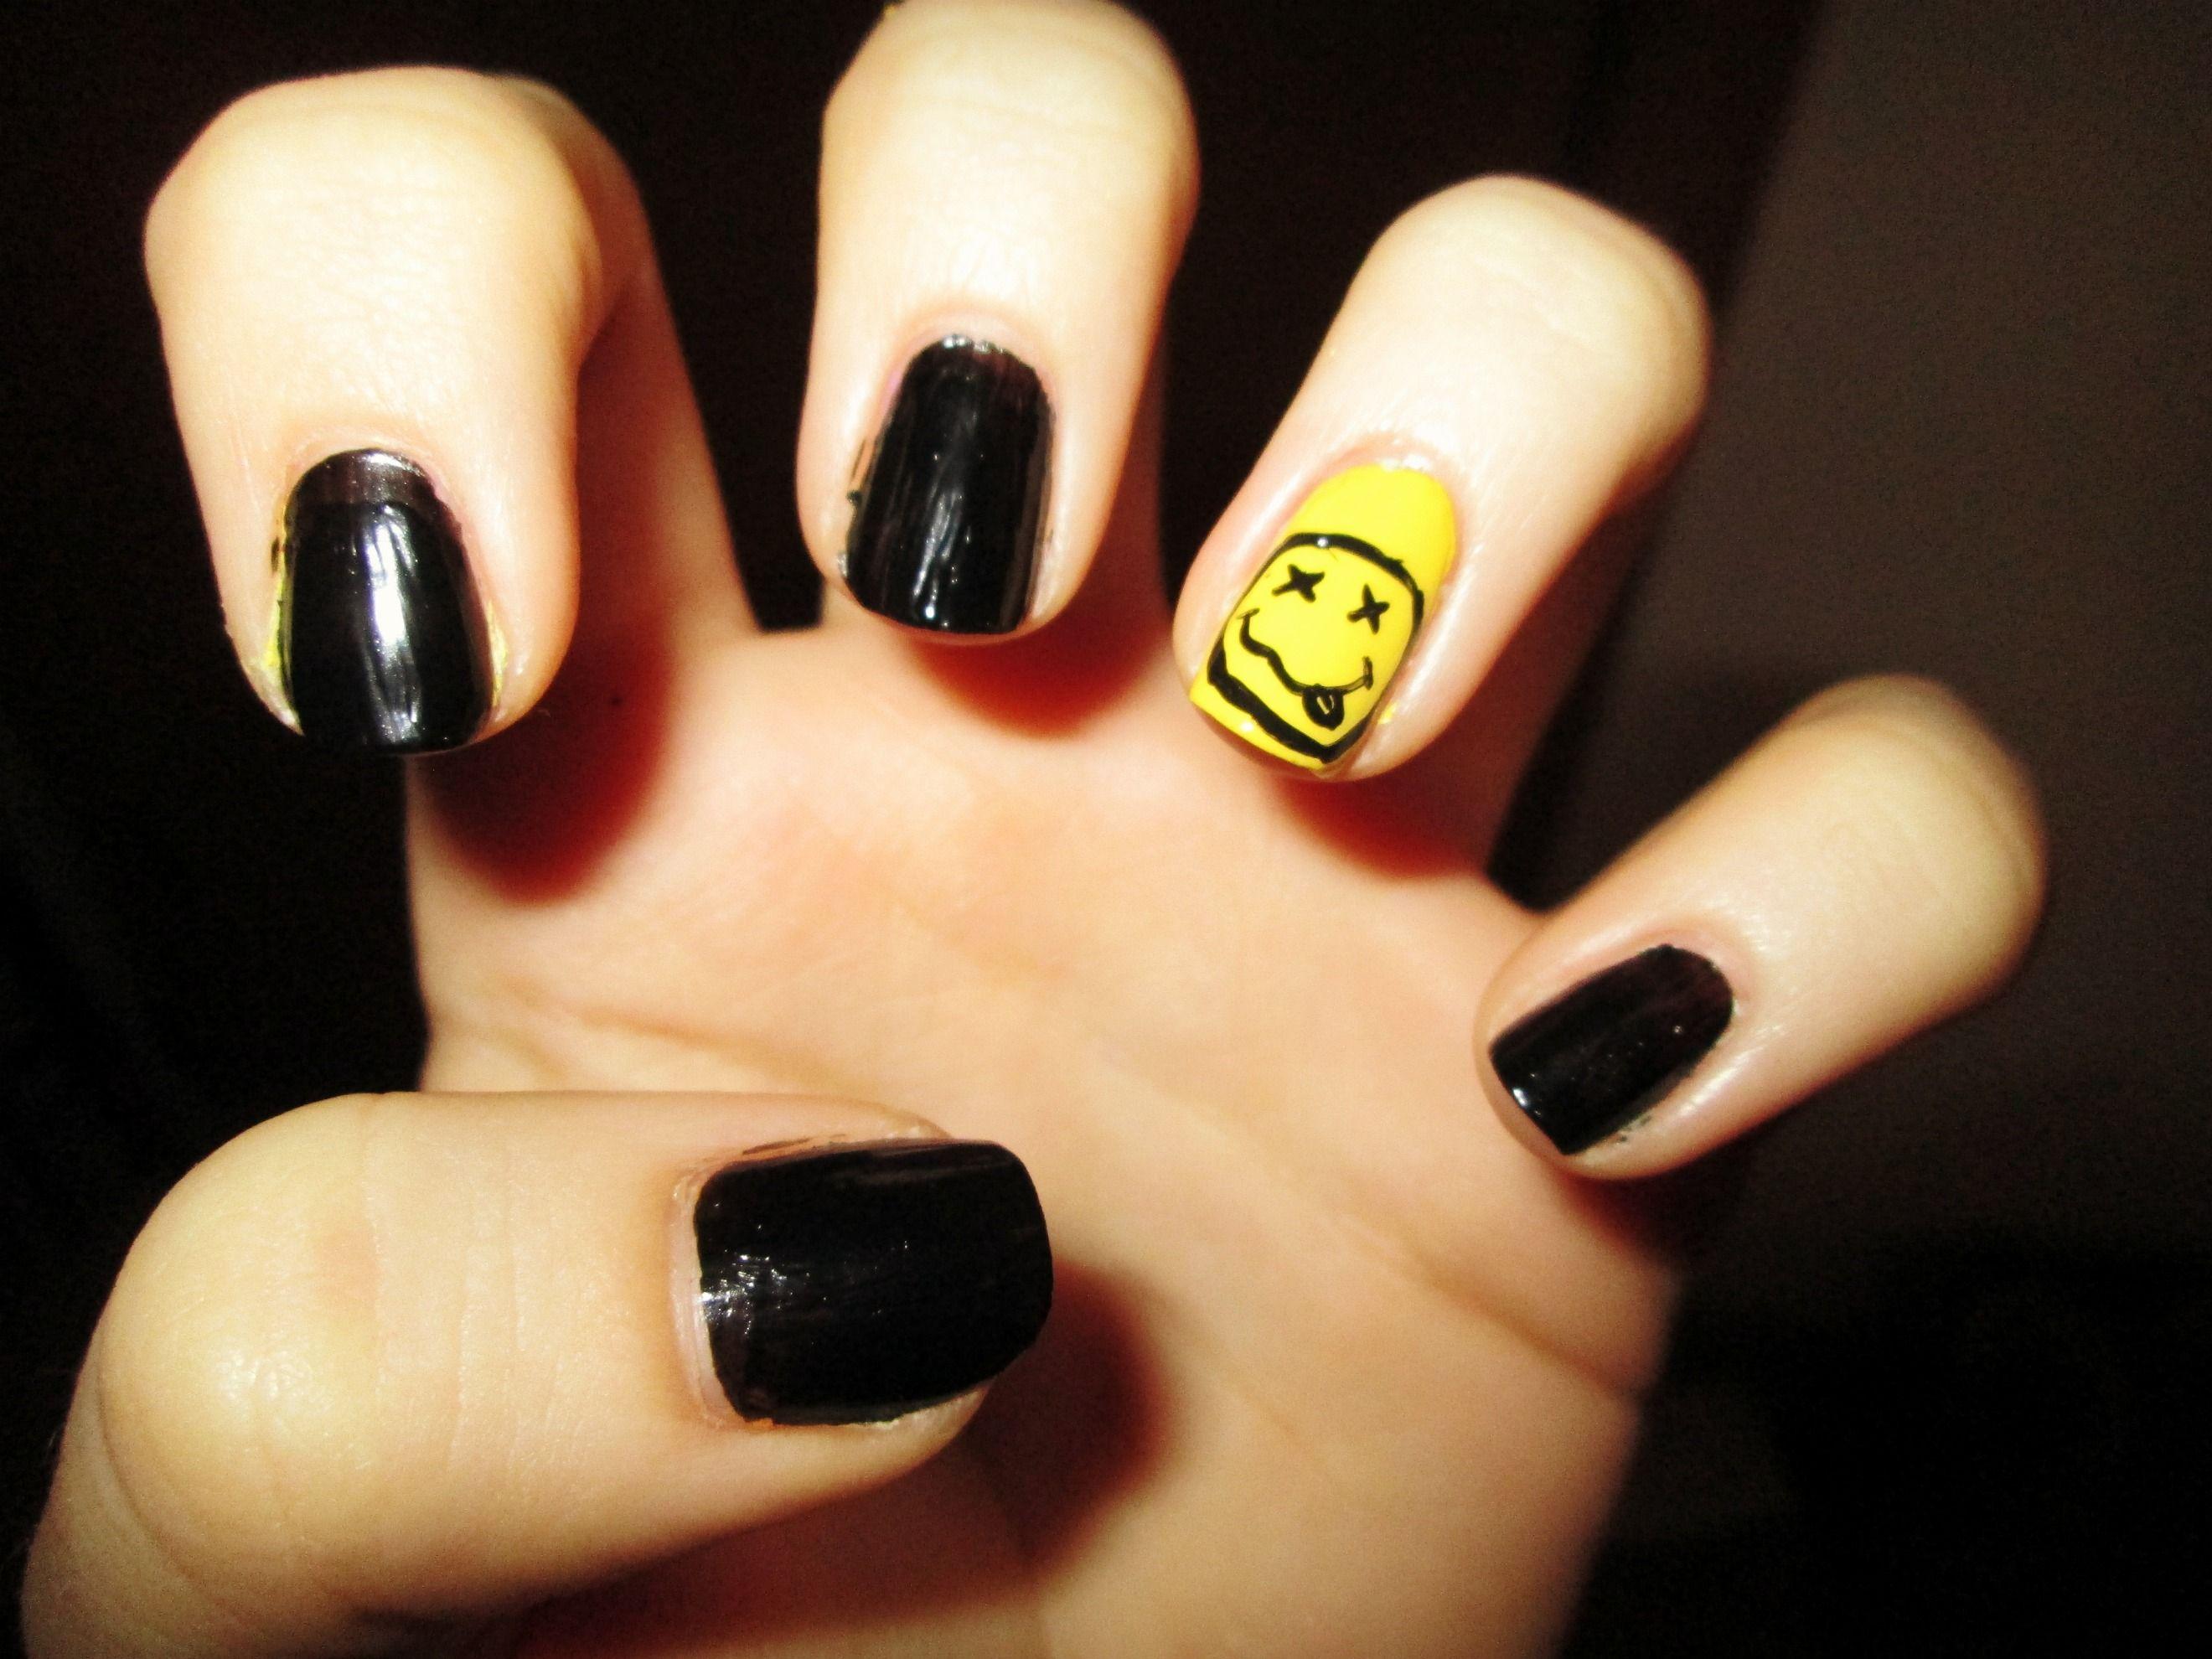 Nirvana #nails #nailart #nirvana | nails | Pinterest | Garra